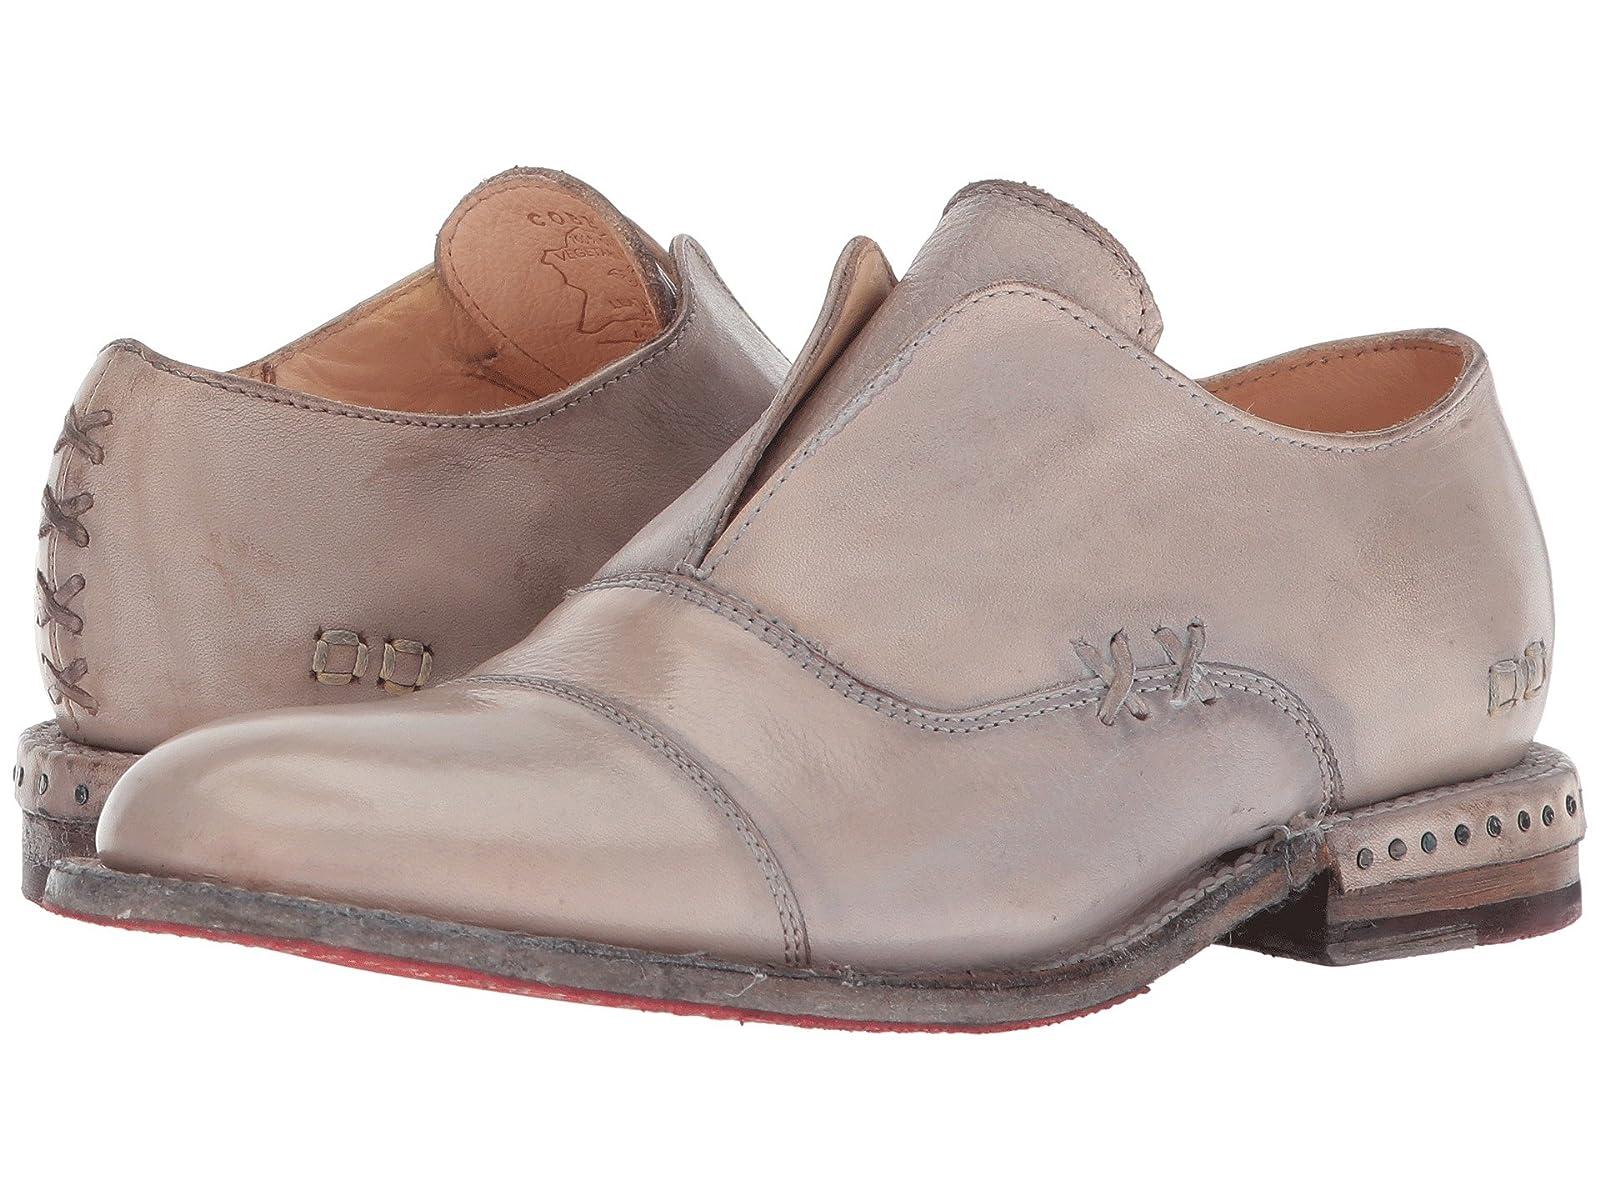 Bed Stu RoseAtmospheric grades have affordable shoes